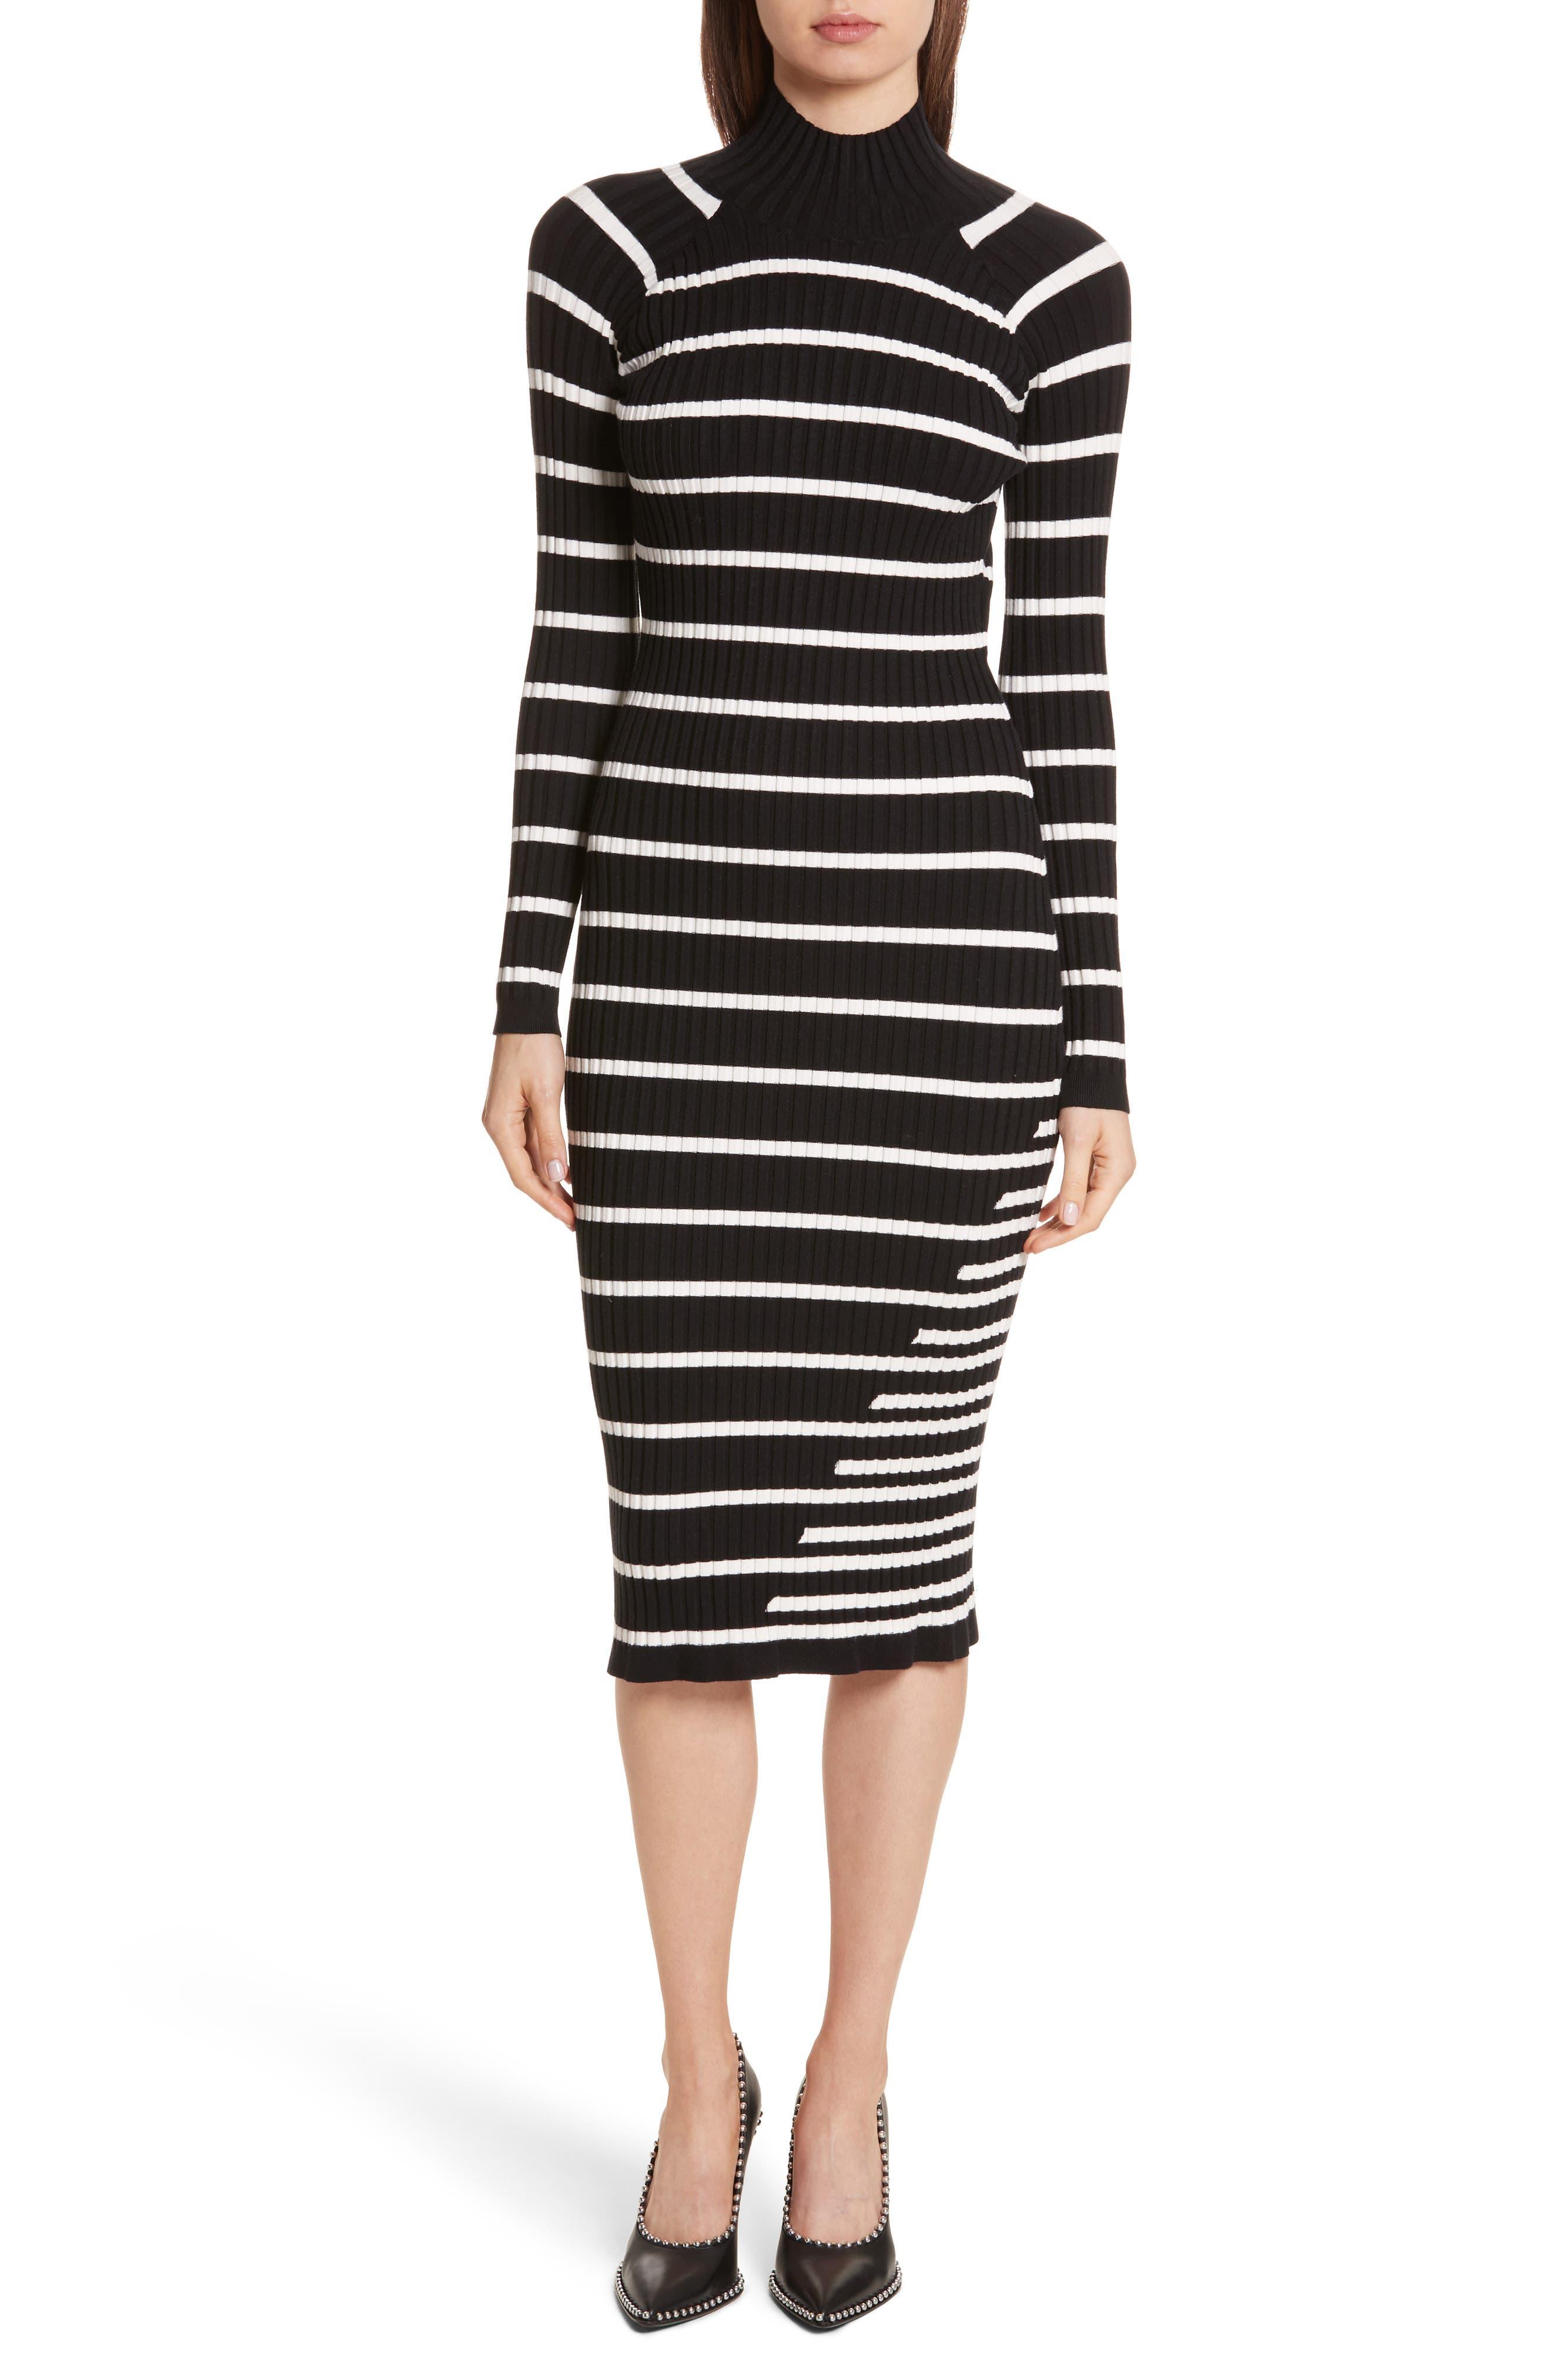 Alternate Image 1 Selected - T by Alexander Wang Stripe Knit Turtleneck Dress